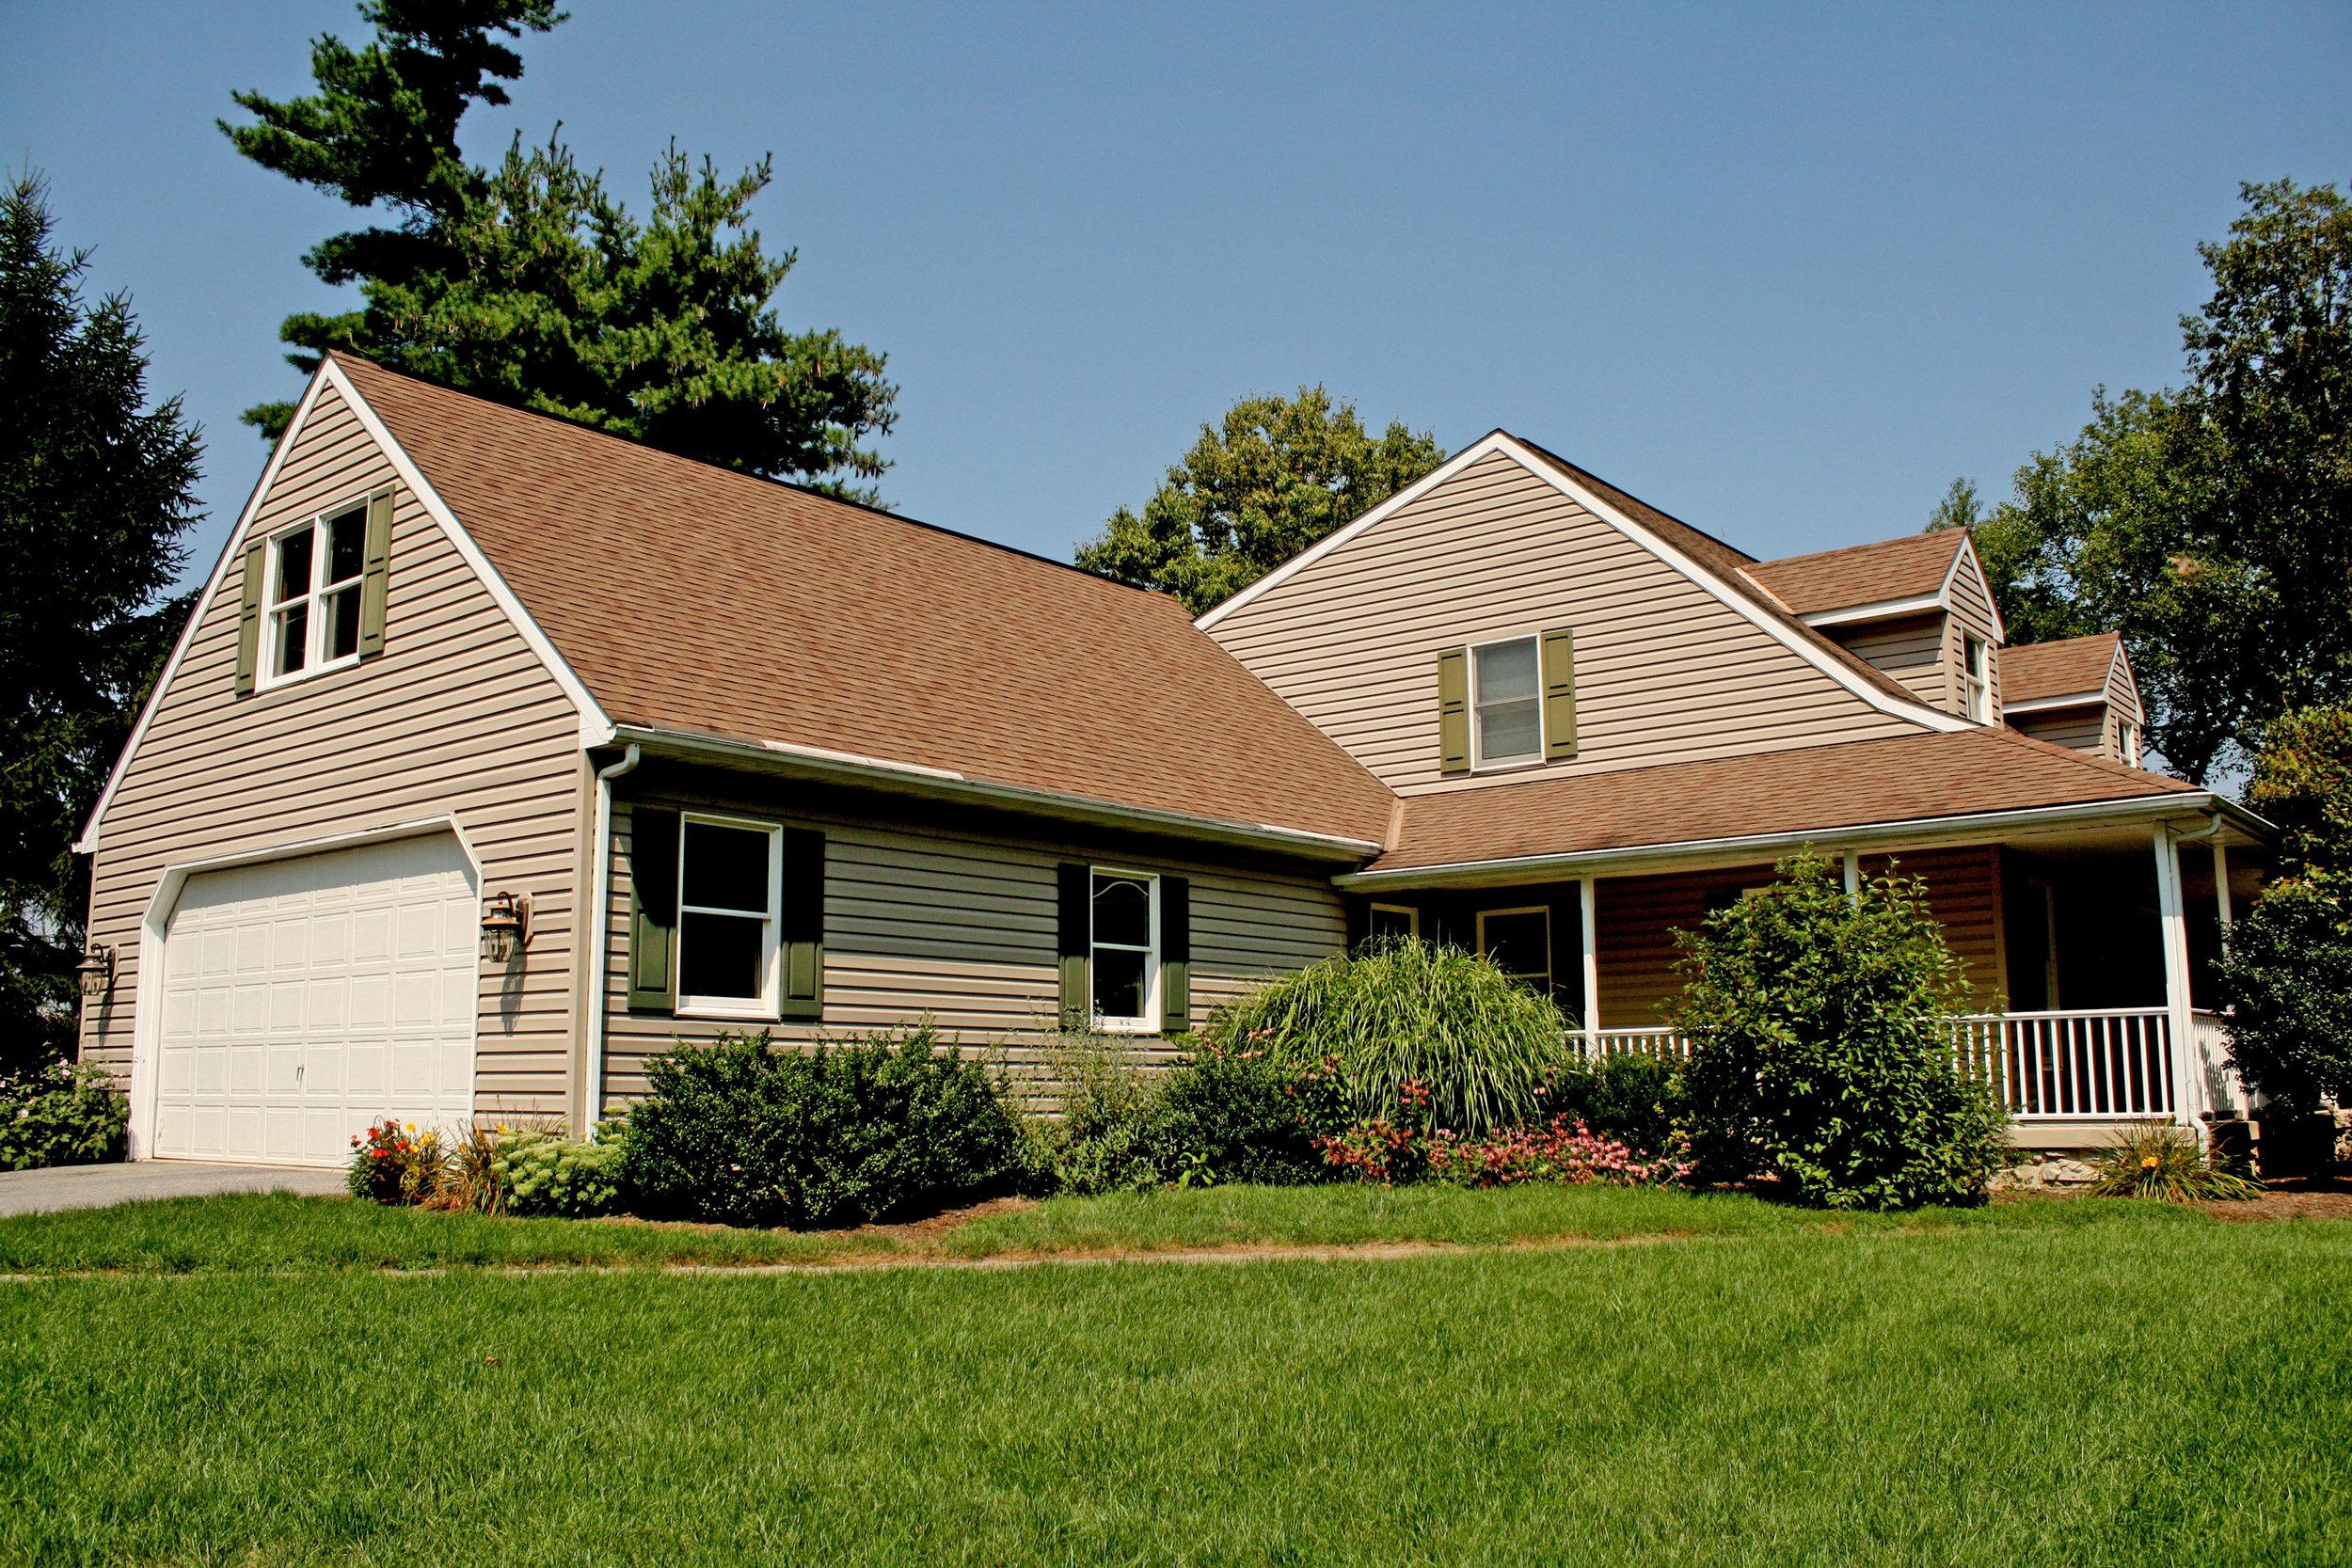 new-home-exterior.jpg